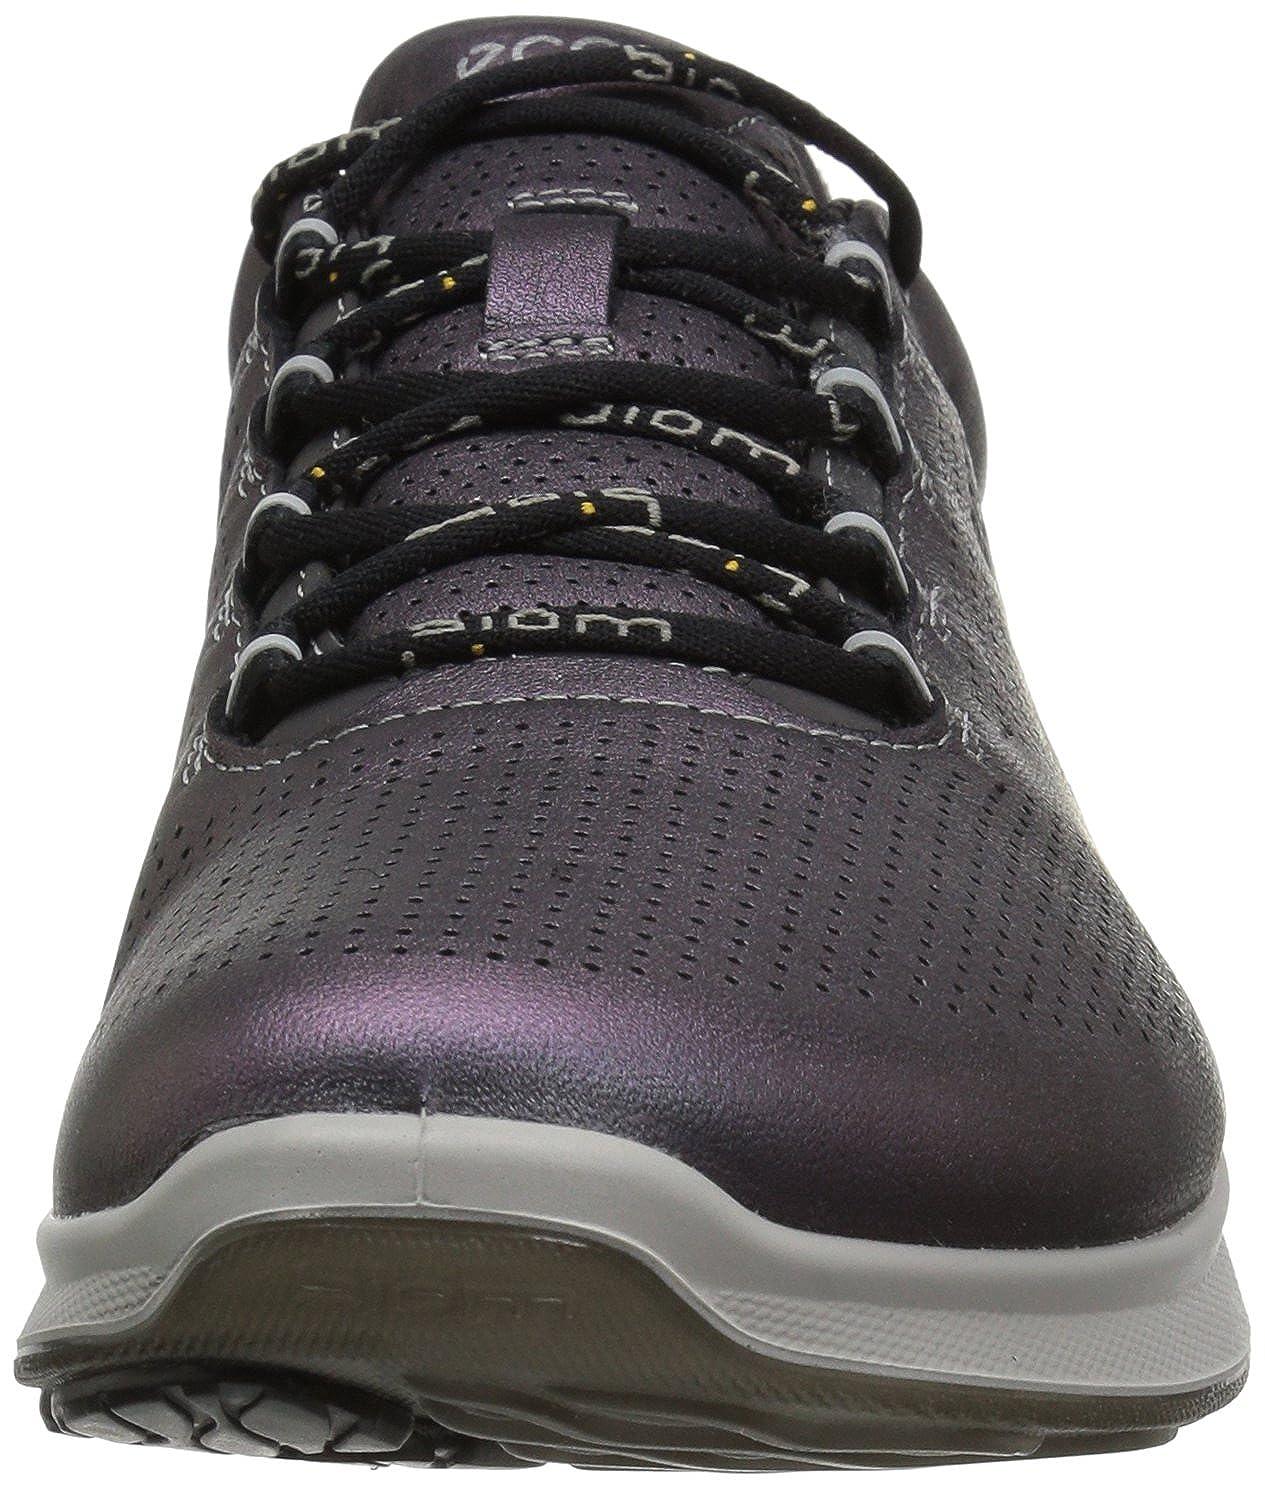 ECCO Biom Fjuel Chaussures de Fitness Femme